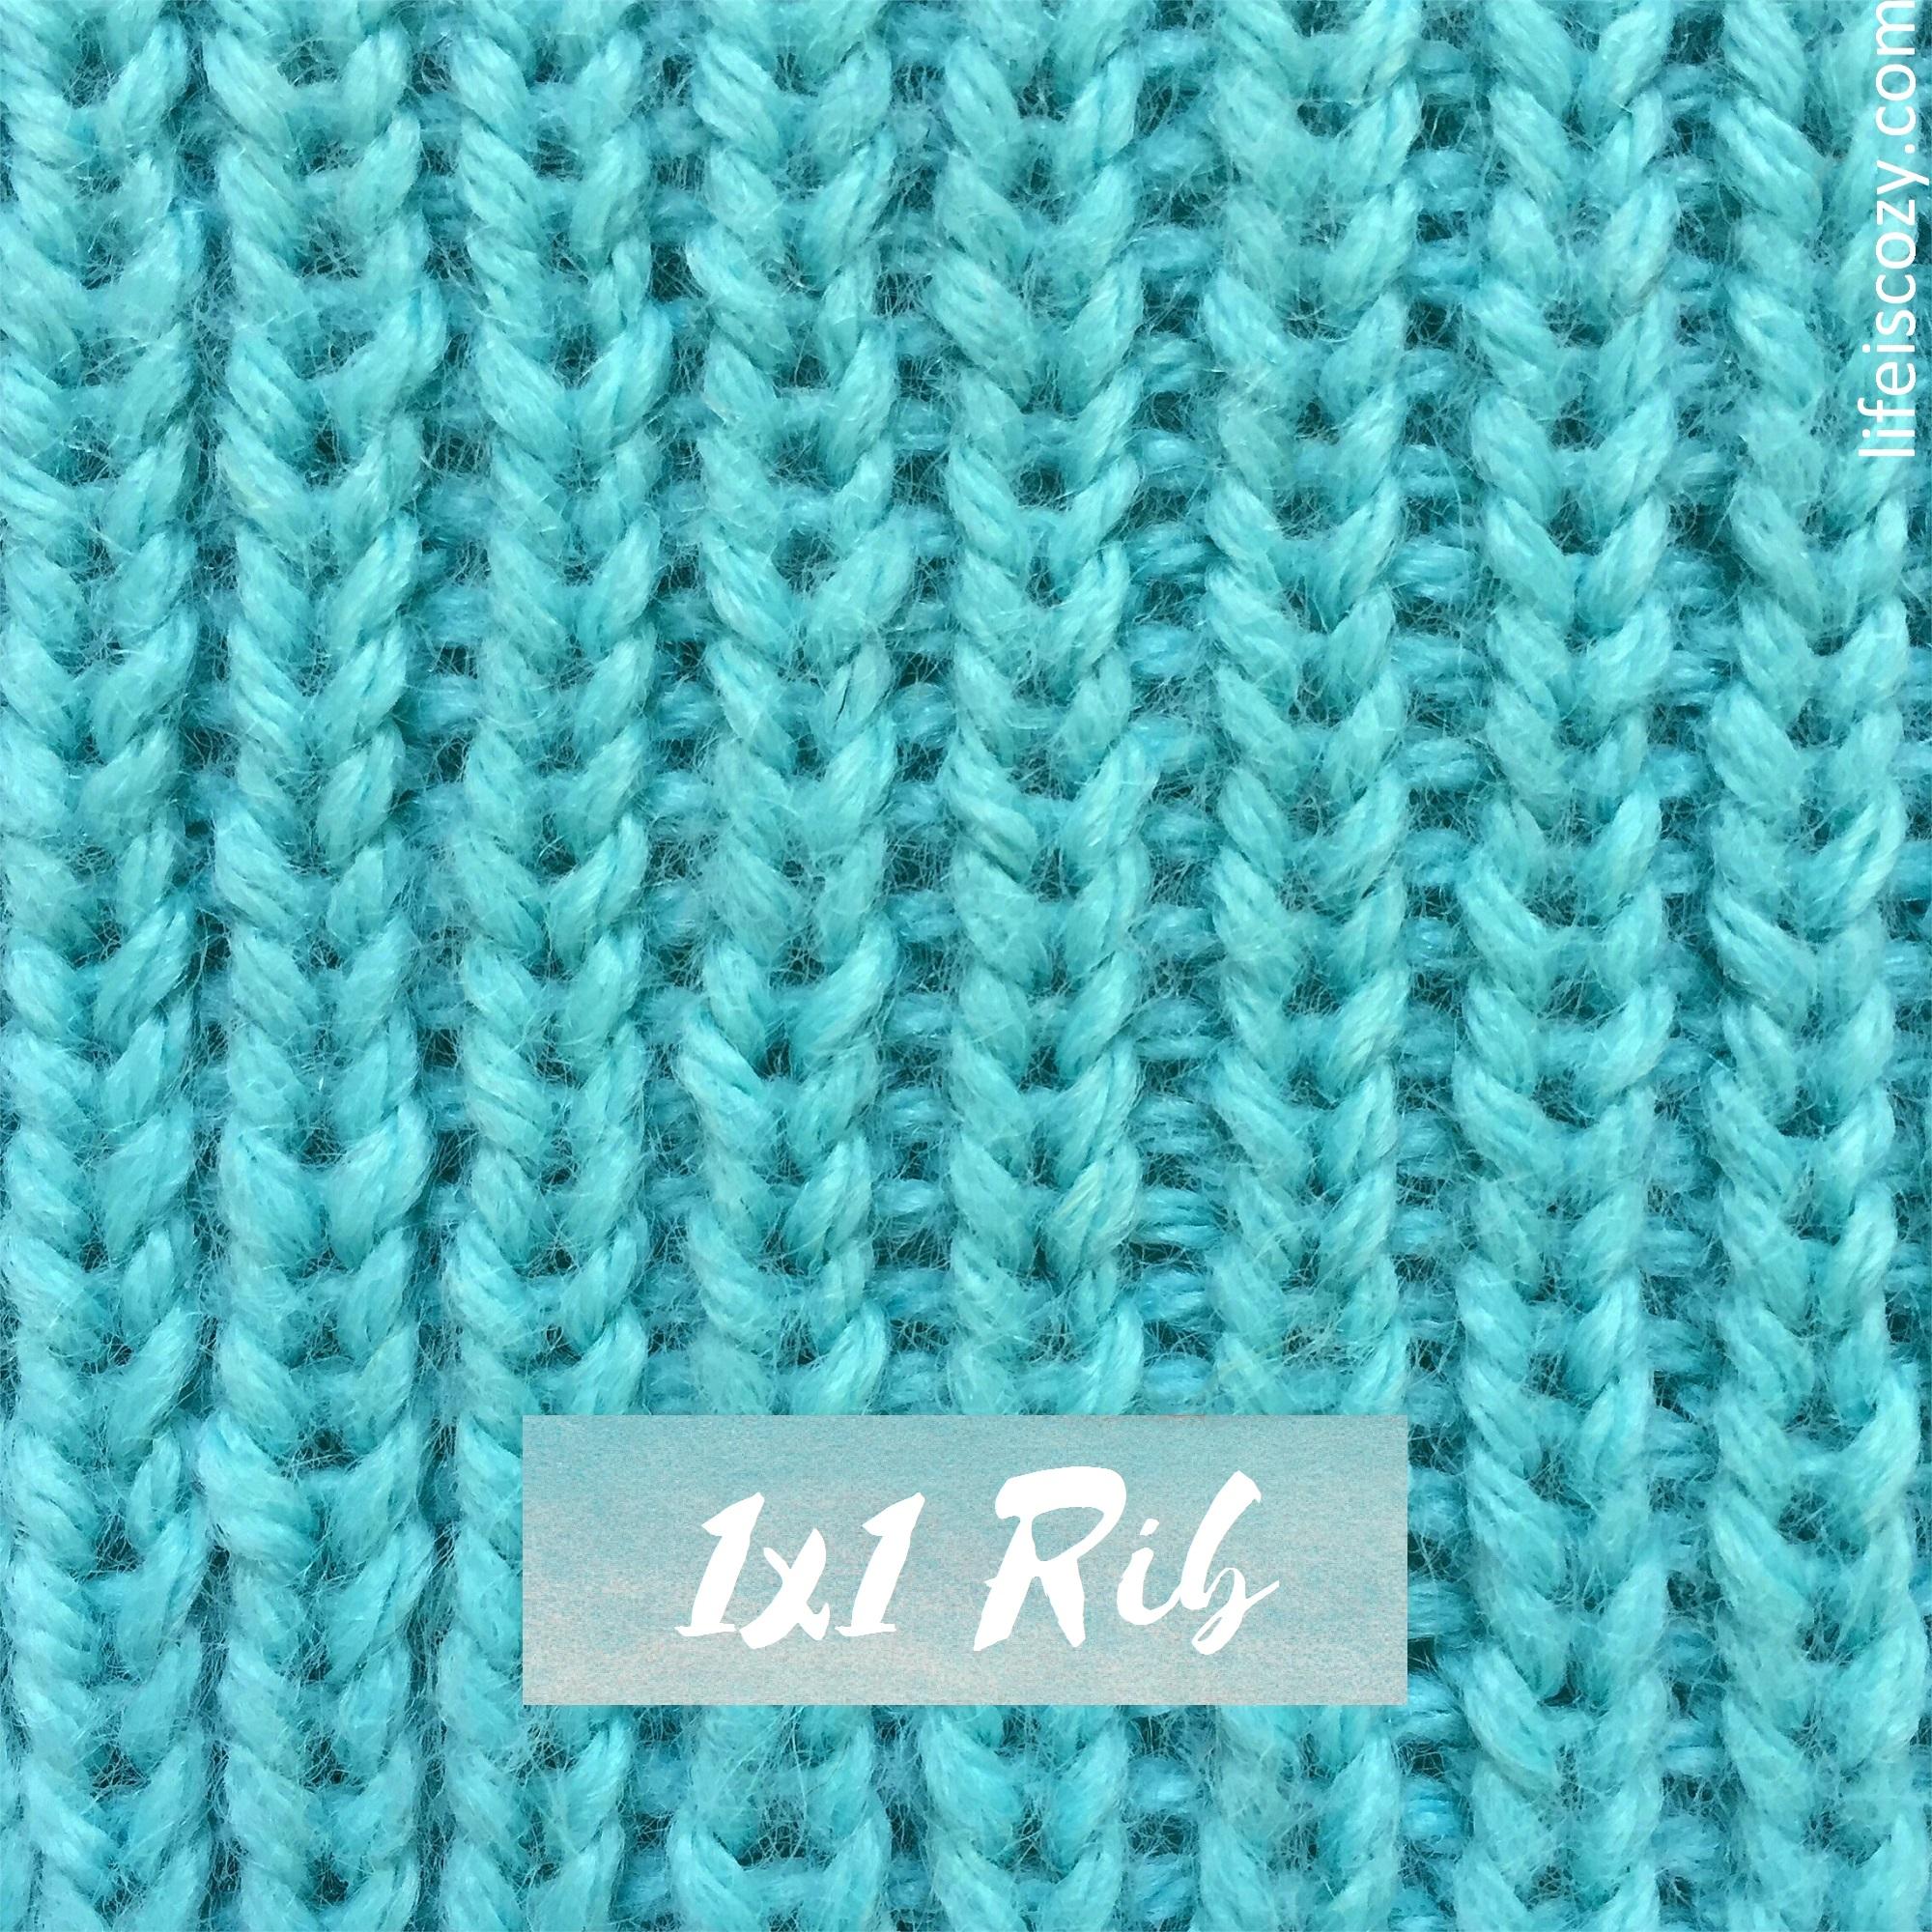 1x1 Rib Stitch Simple Ribbing How to knit